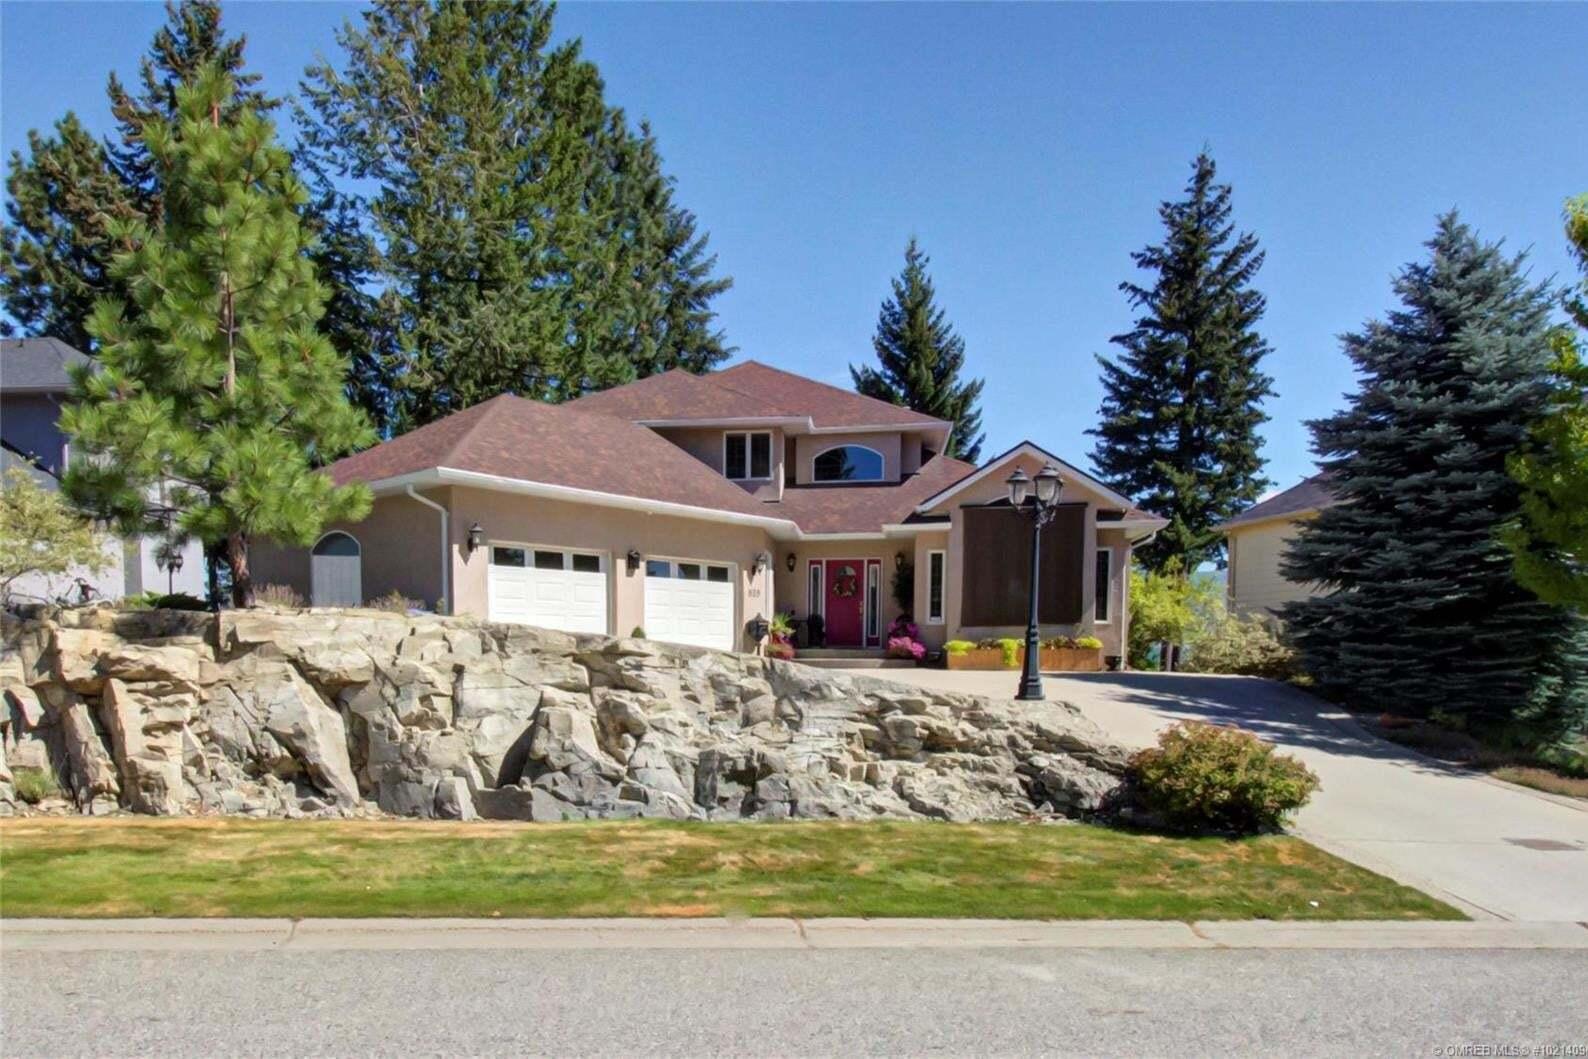 House for sale at 939 Stikine Ct Kelowna British Columbia - MLS: 10214096